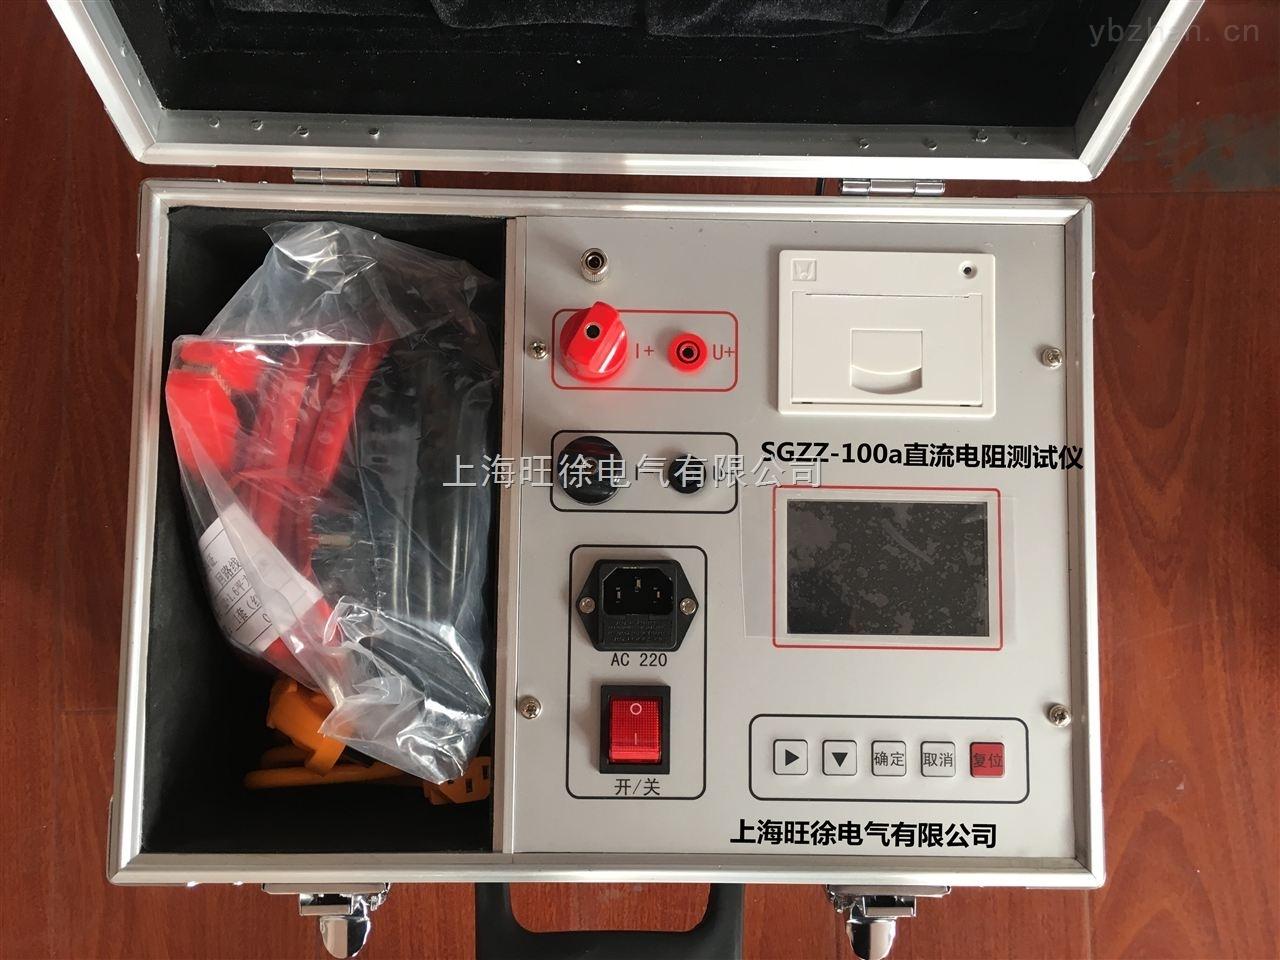 SGZZ-100a直流電阻快速測試儀